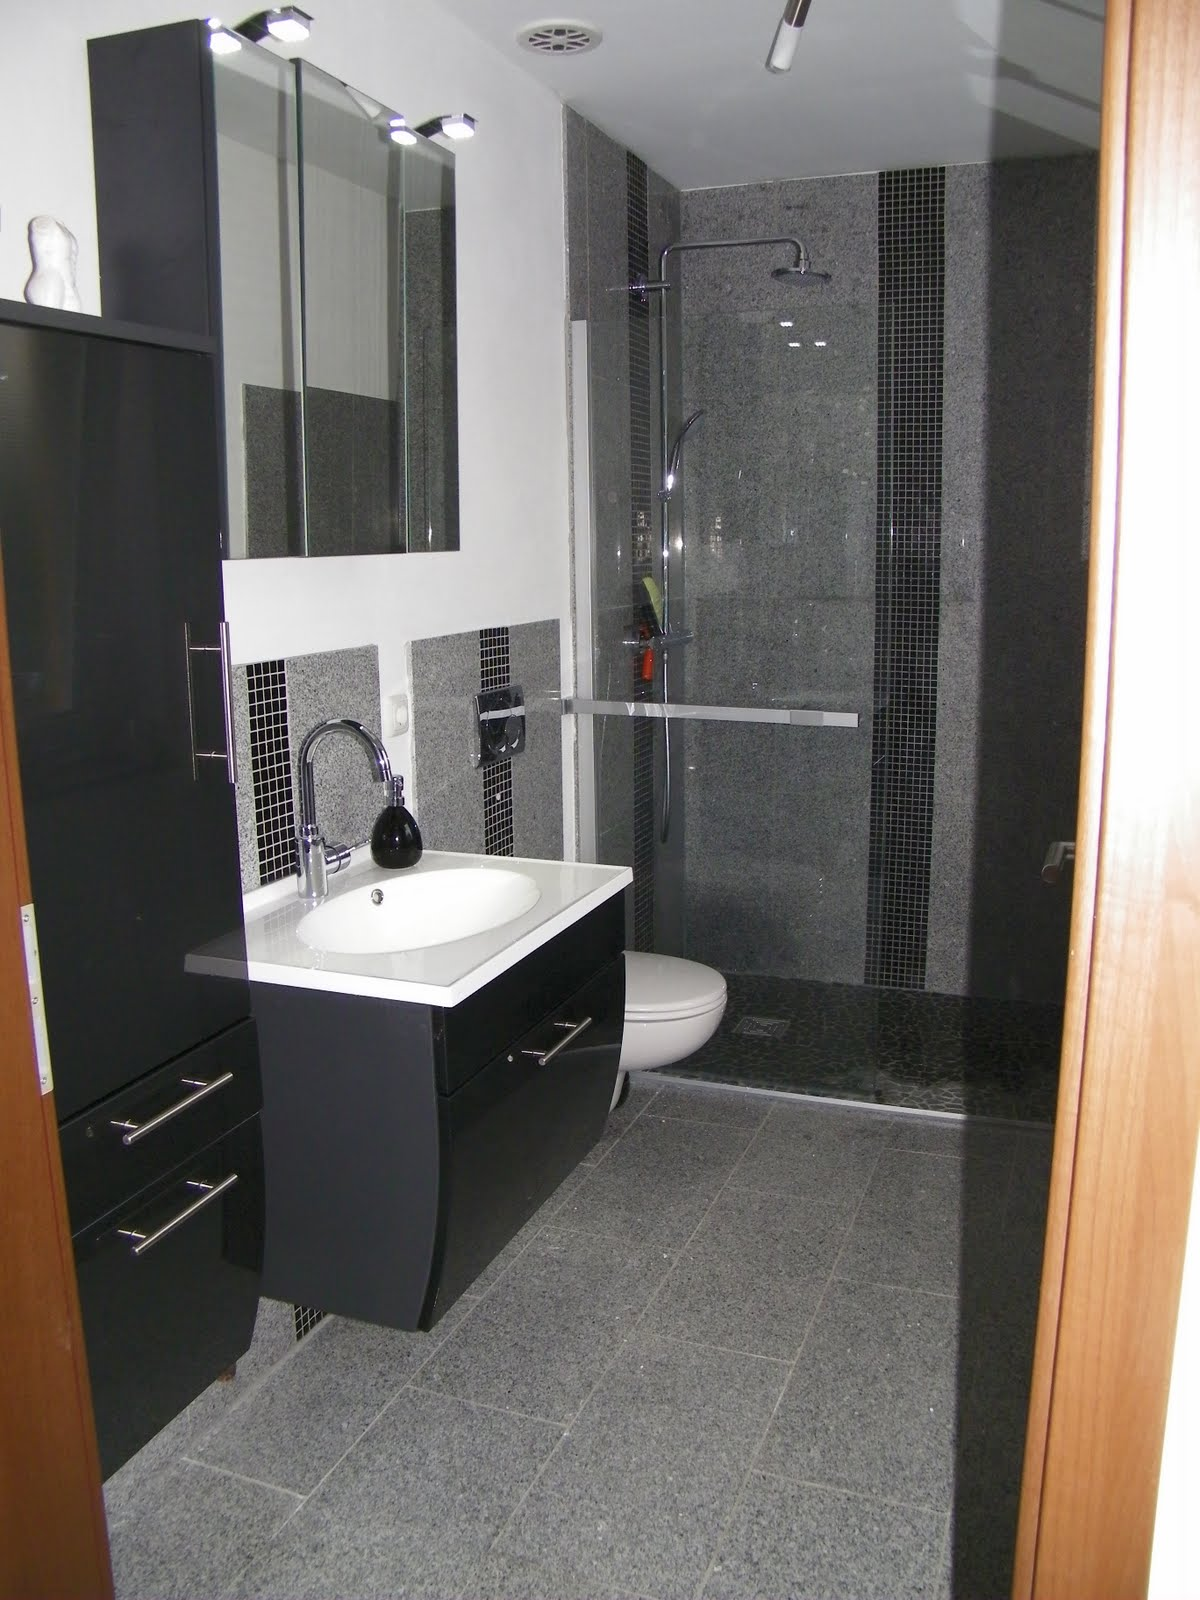 bautagebuch solingen putz putz putz and let the sun. Black Bedroom Furniture Sets. Home Design Ideas